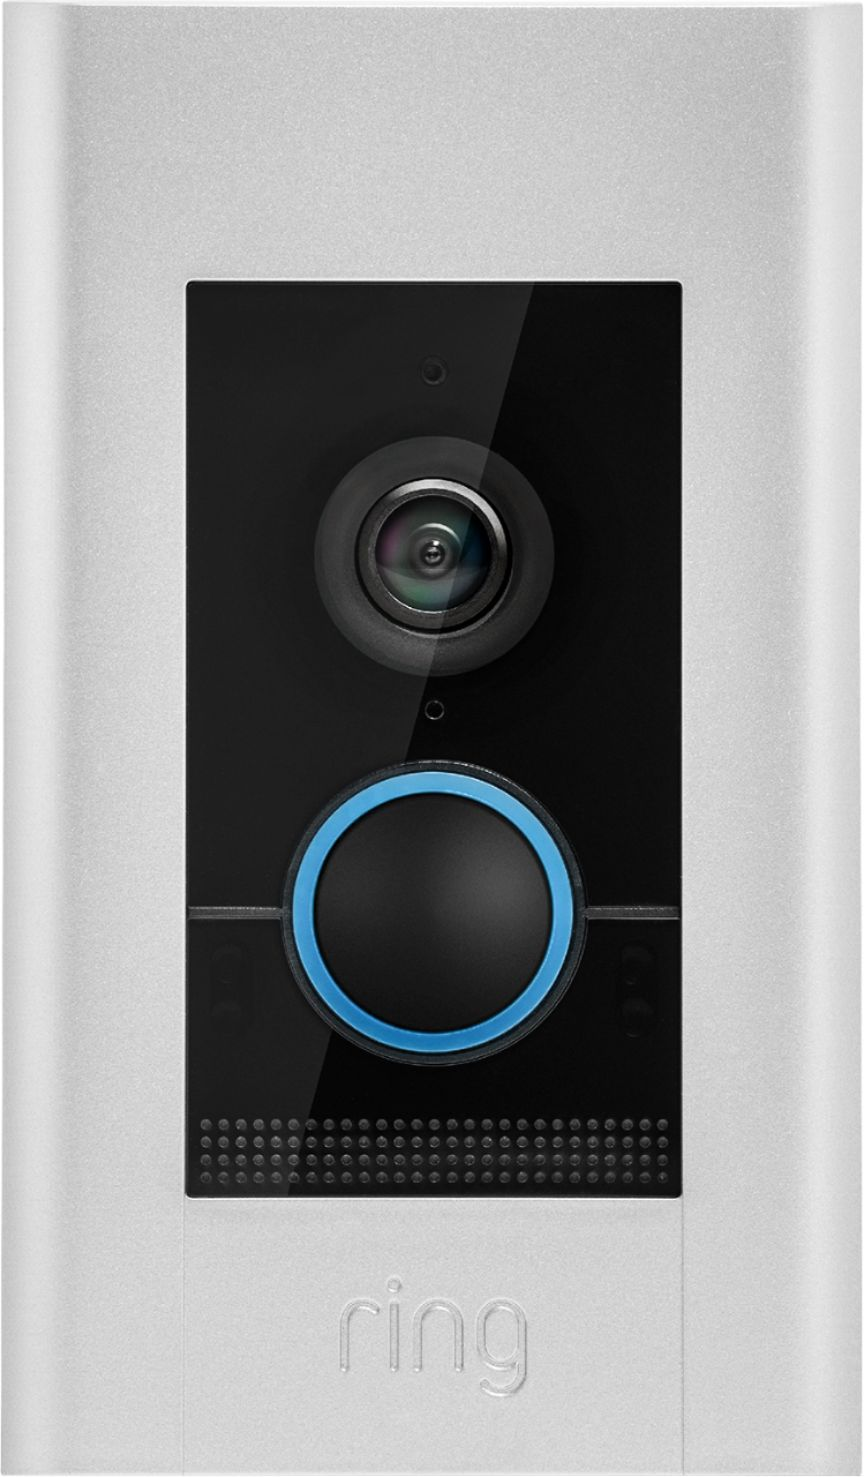 Shop Ring Video Doorbell Elite Satin Nickel at Best Buy